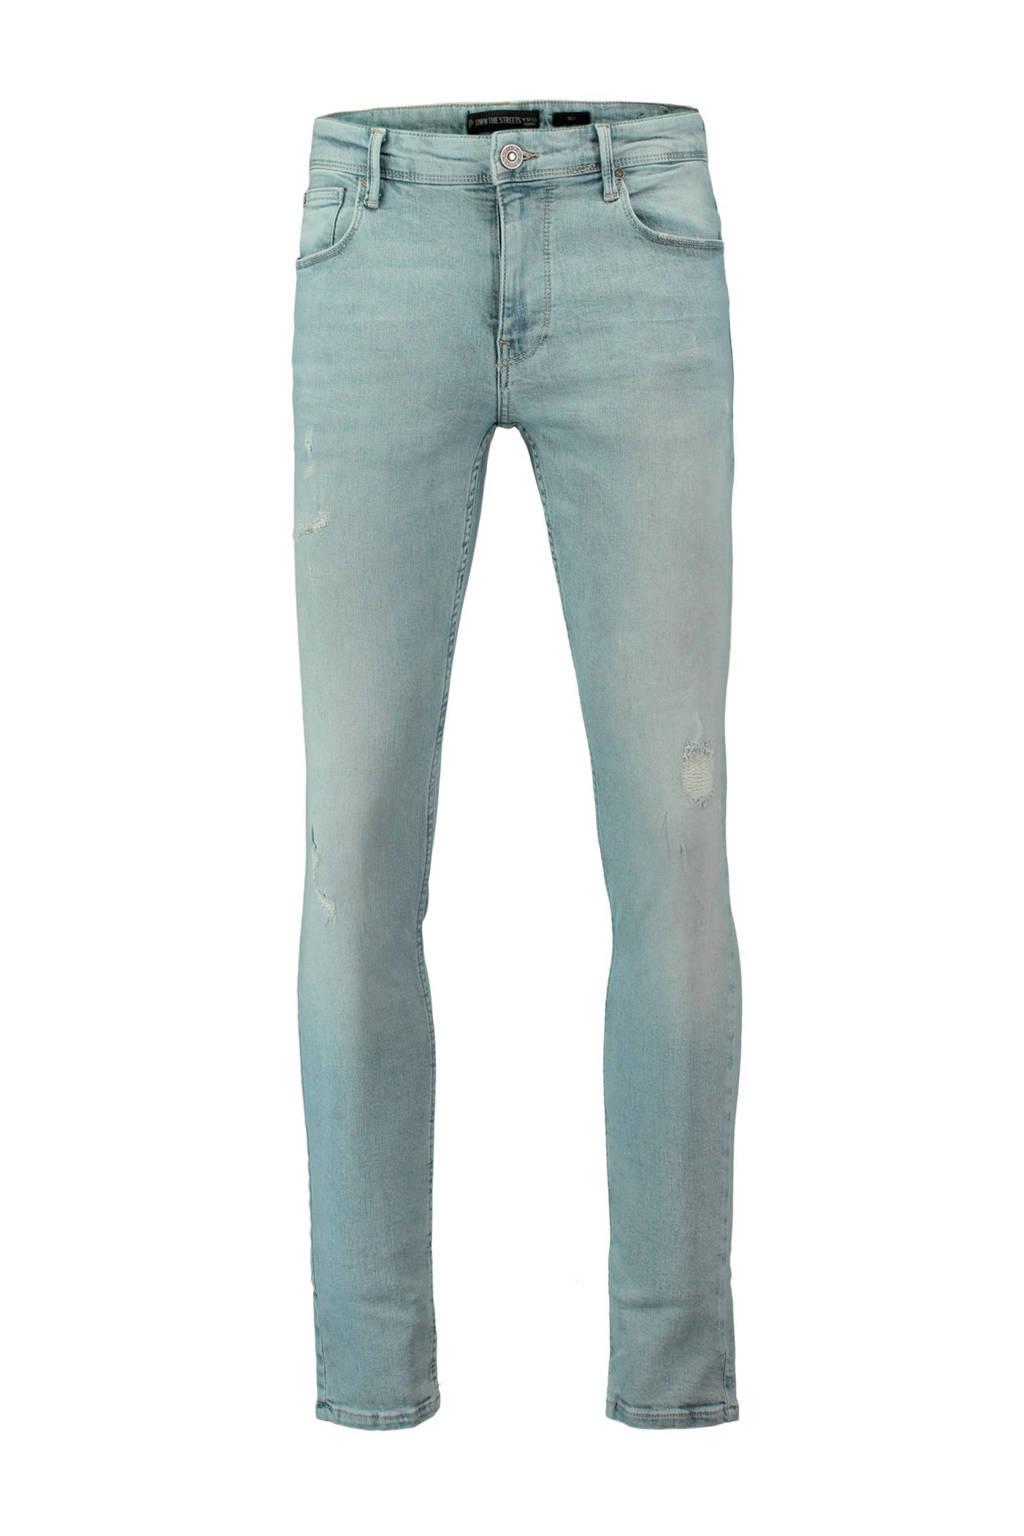 CoolCat skinny jeans, Light denim